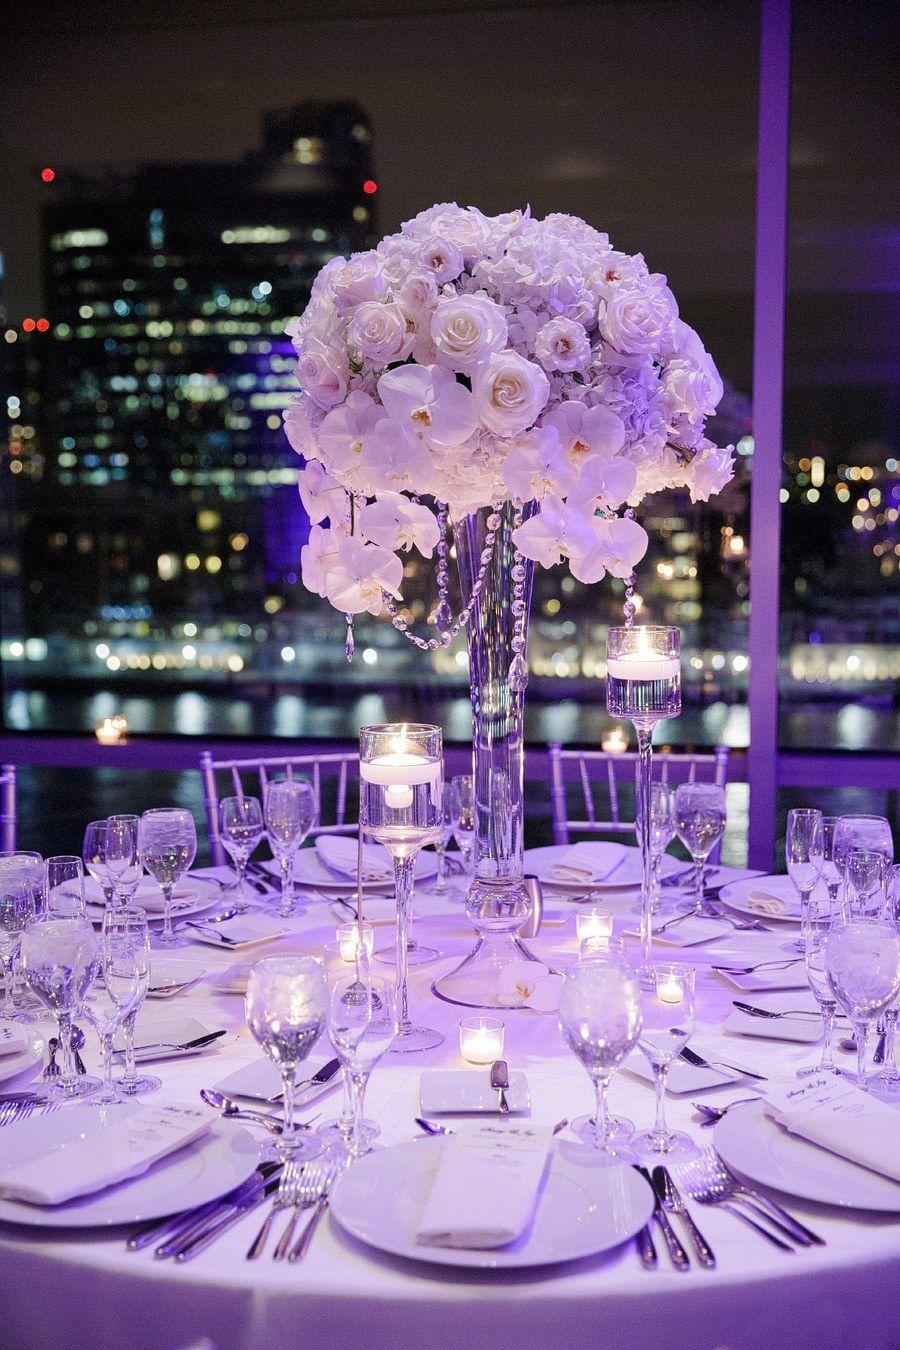 Breathtaking new jersey wedding wedding wedding and centrepieces breathtaking new jersey wedding wedding vasestall reviewsmspy